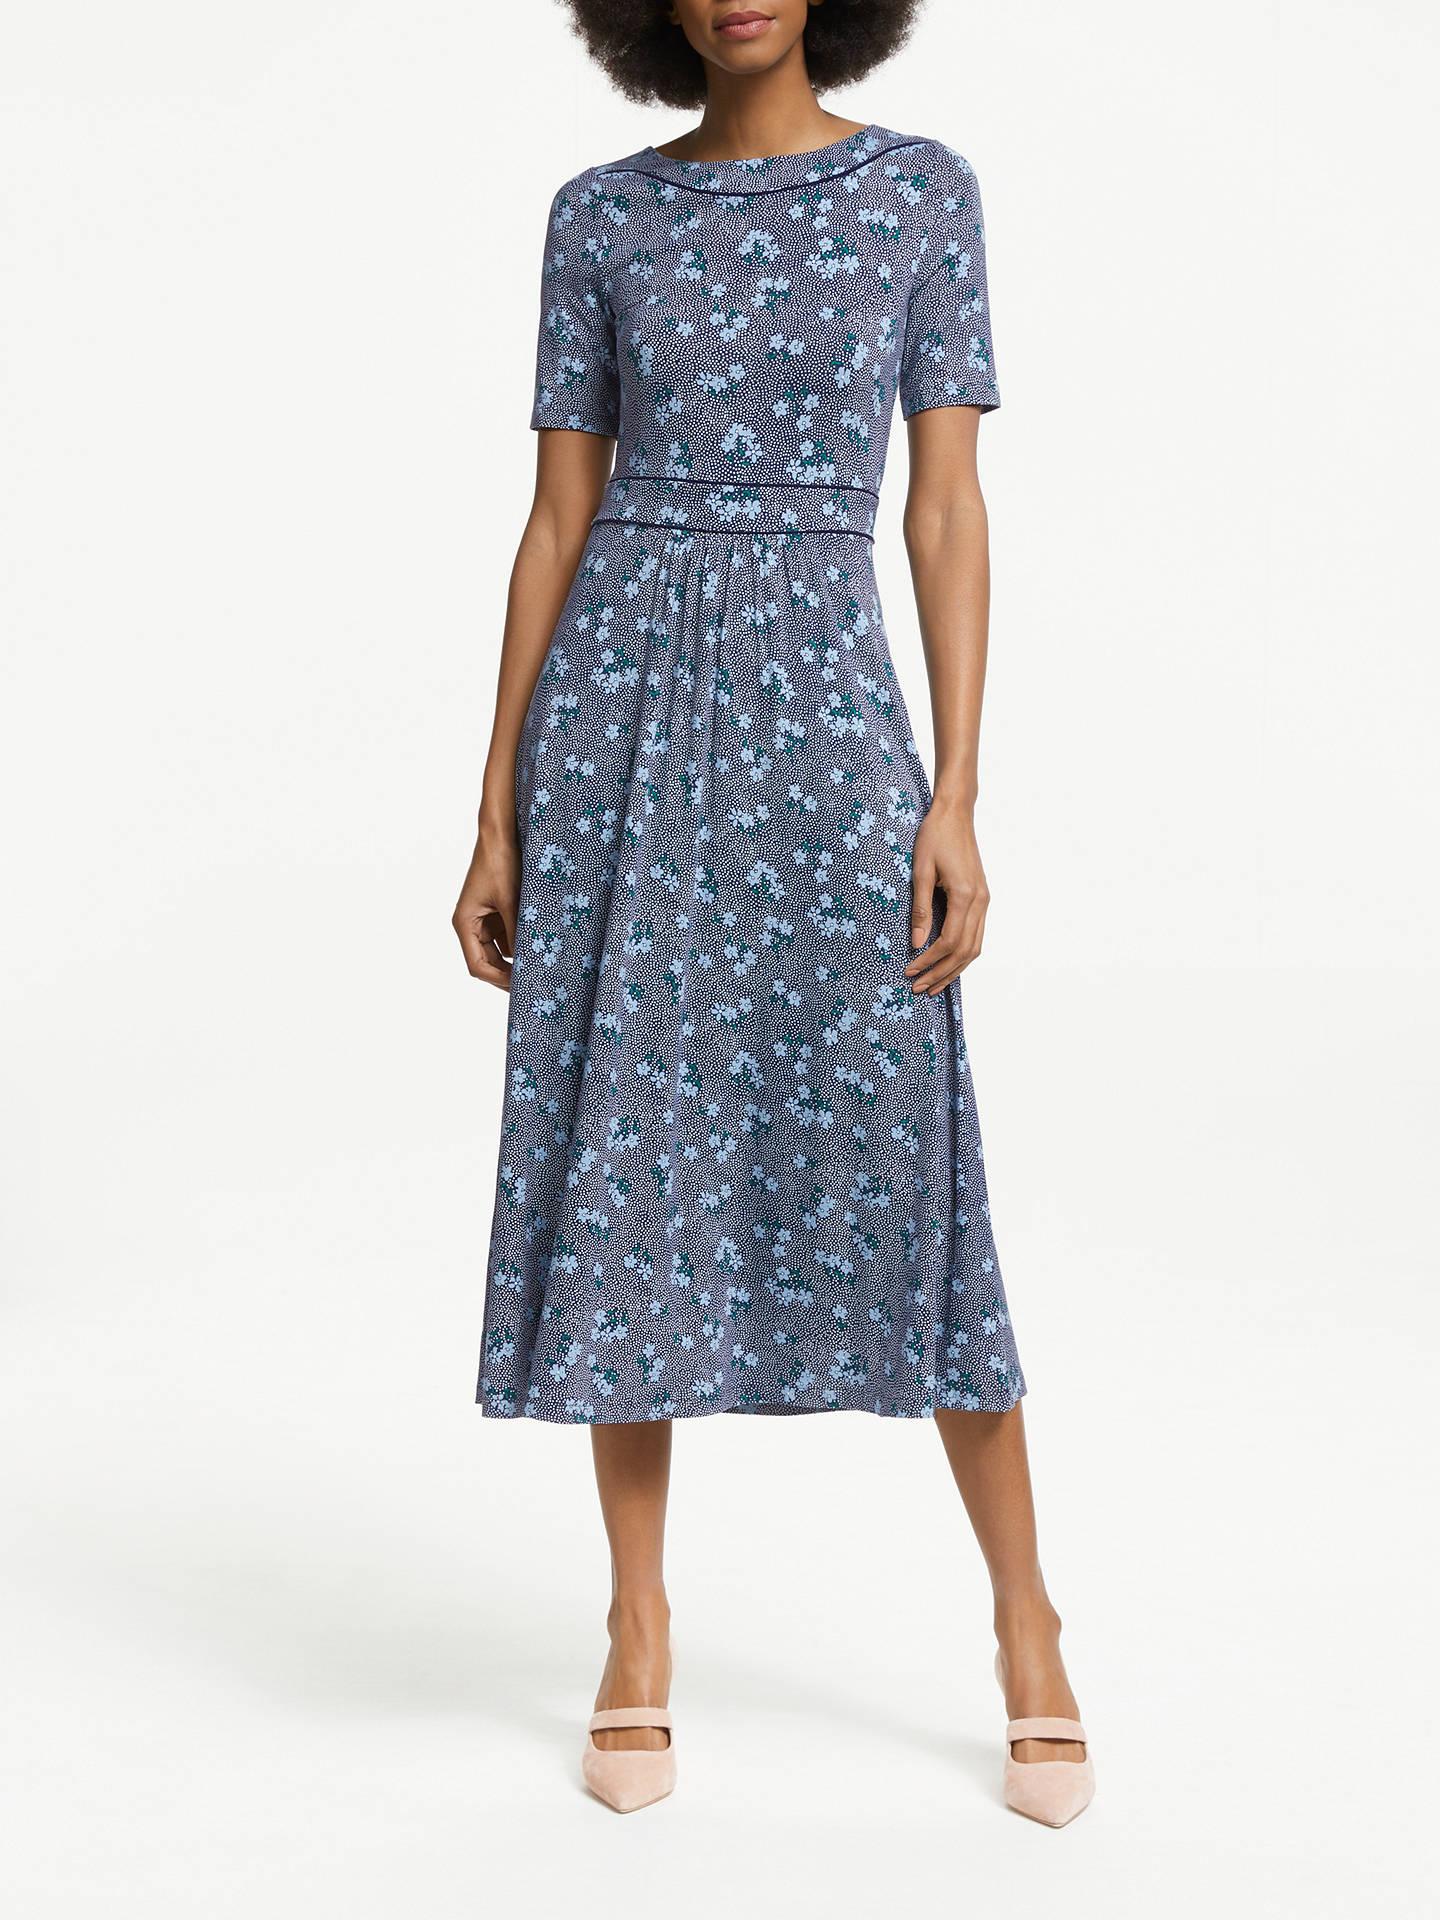 8edc89fb60bde Buy Boden Ava Floral Spot Midi Dress, Navy/Heron Blue, 8 Online at ...